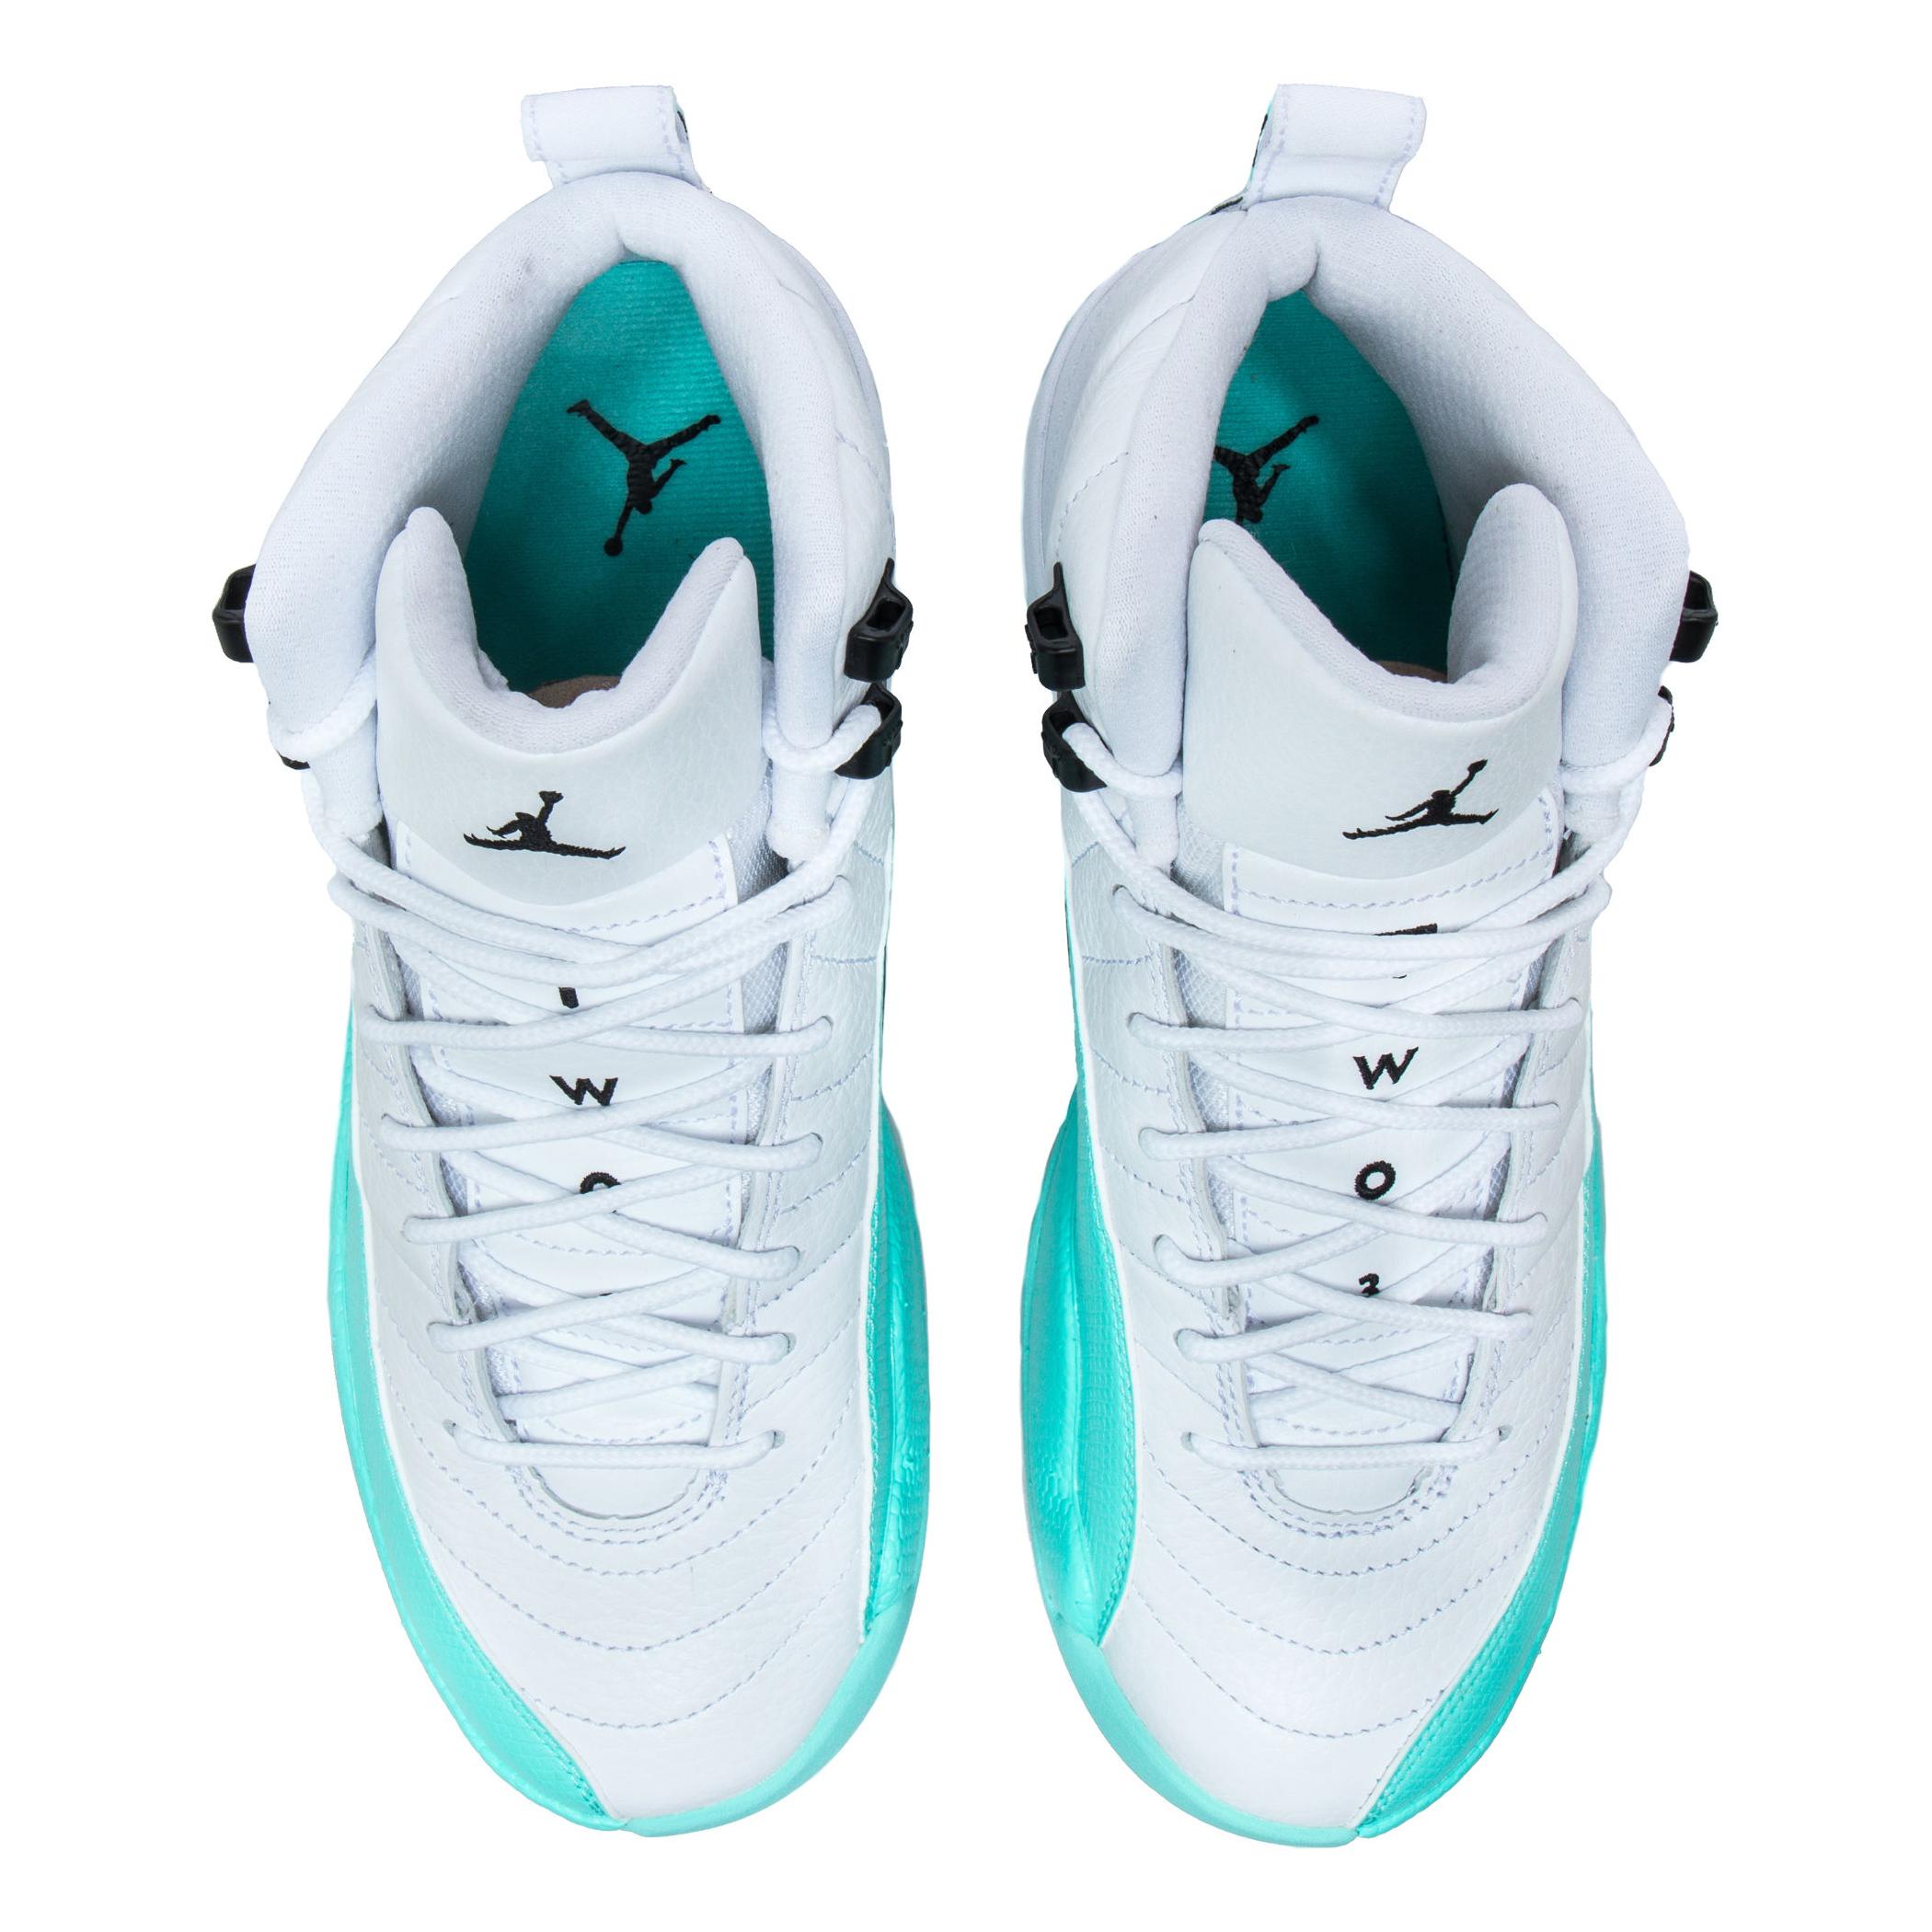 best website 9a680 4d869 Check Out This 'Light Aqua' Air Jordan 12 Retro - WearTesters